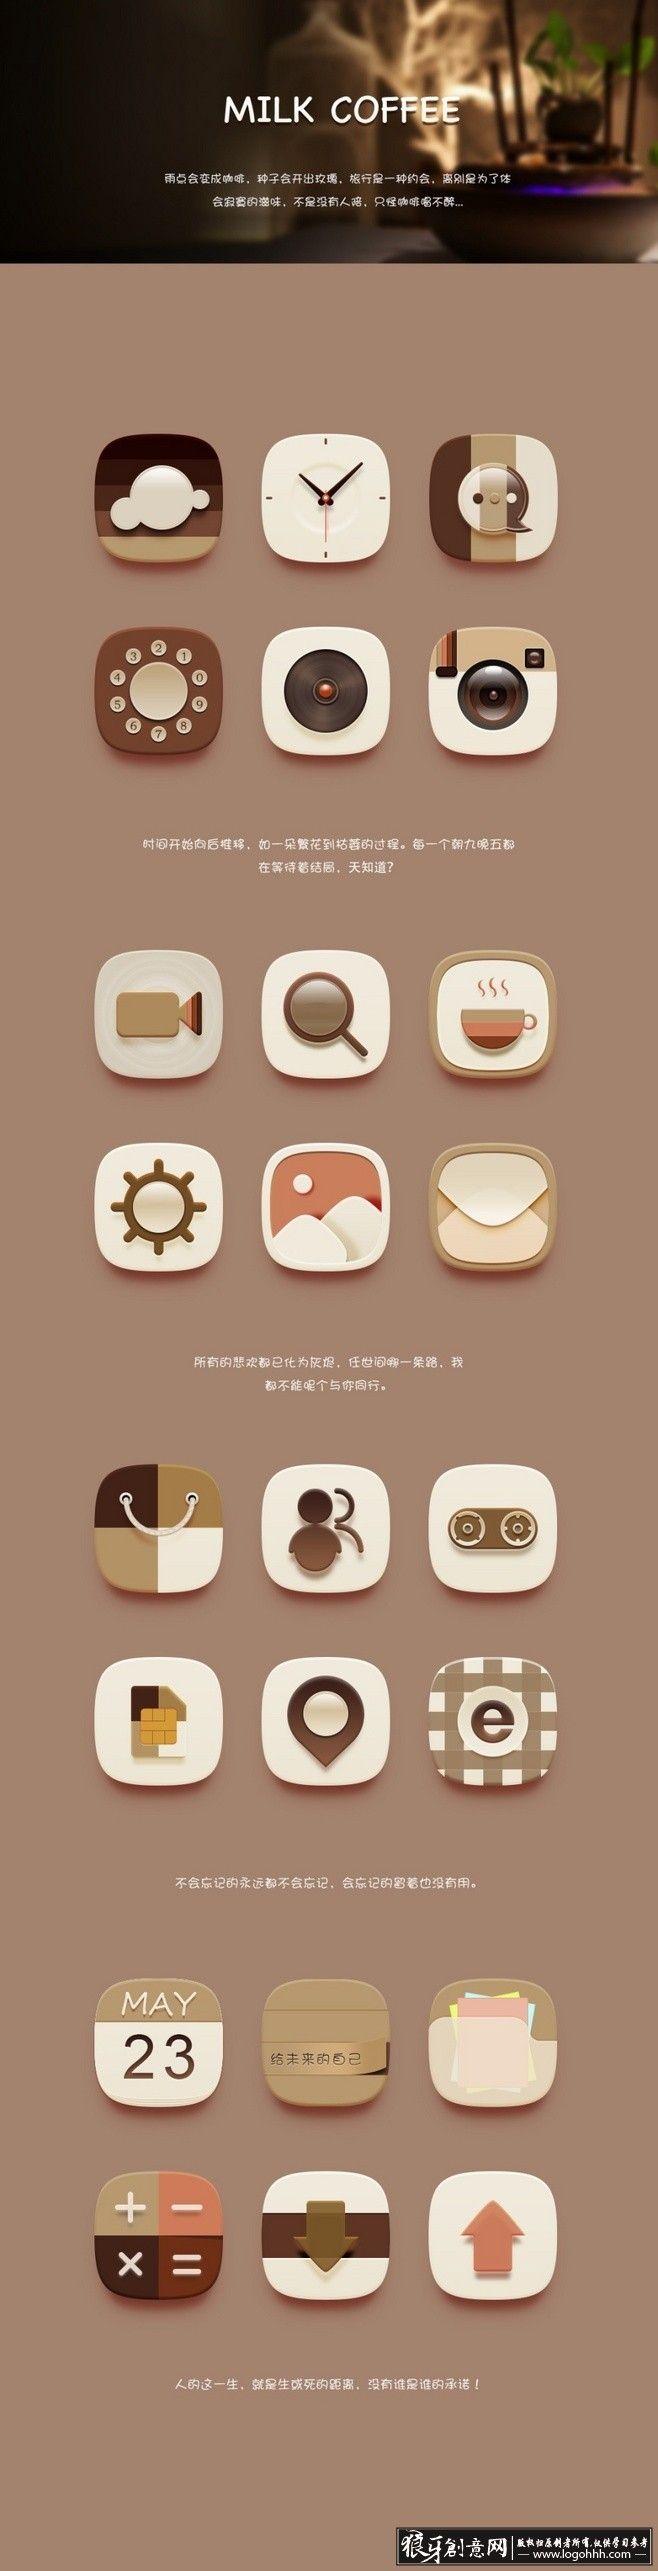 [UI/APP] 牛奶咖啡UI设计灵感 ...                                                                                                                                                      More